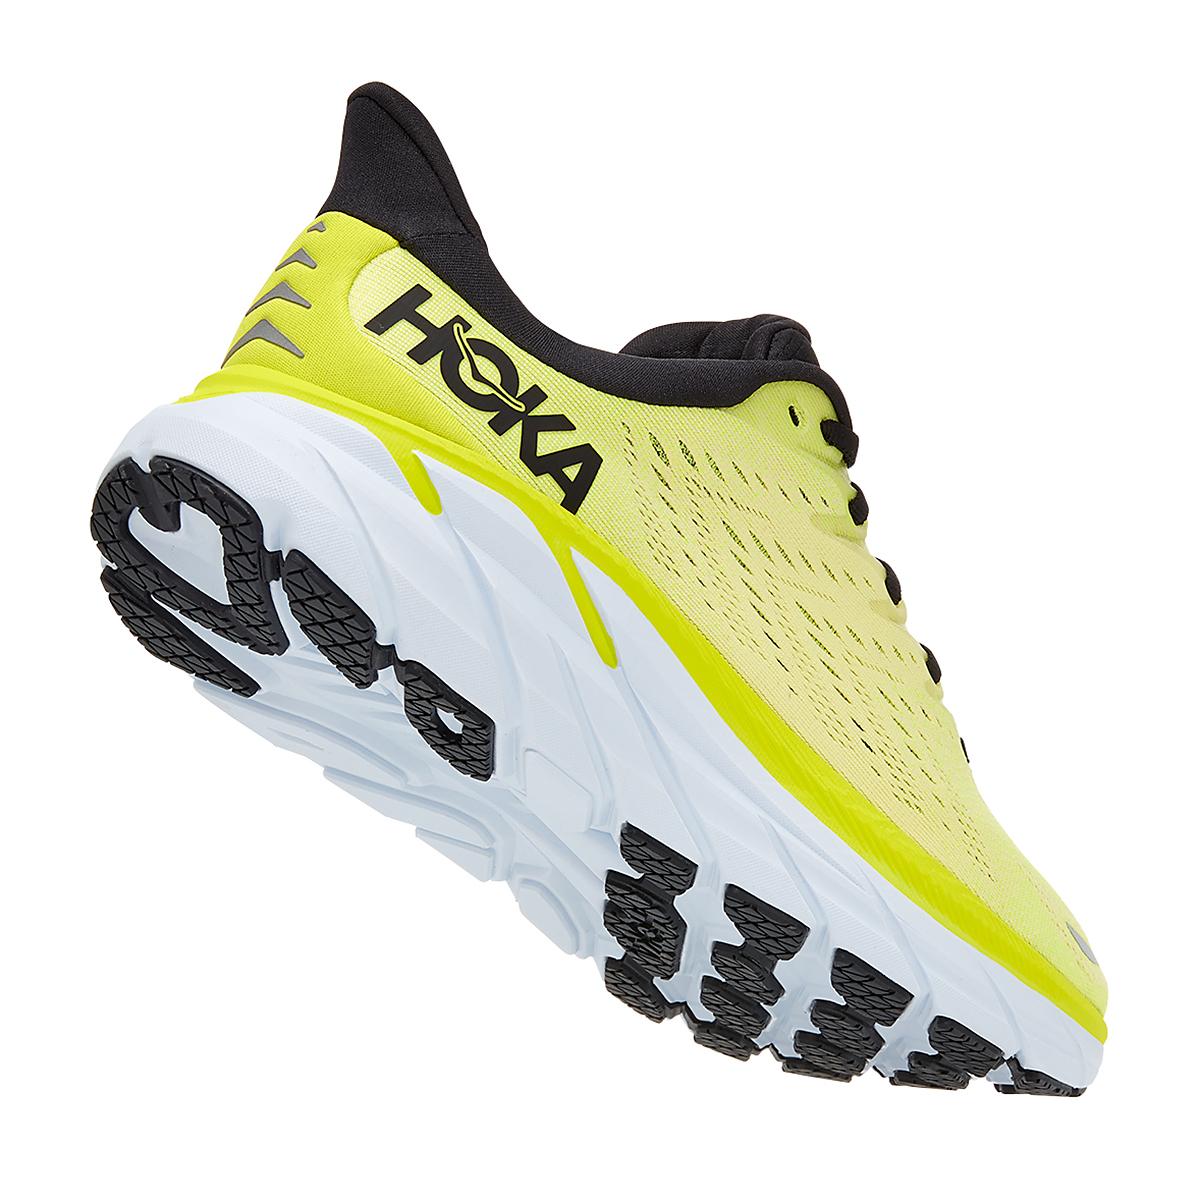 Men's Hoka One One Clifton 8 Running Shoe - Color: Evening Primrose/Charlock - Size: 7 - Width: Regular, Evening Primrose/Charlock, large, image 3